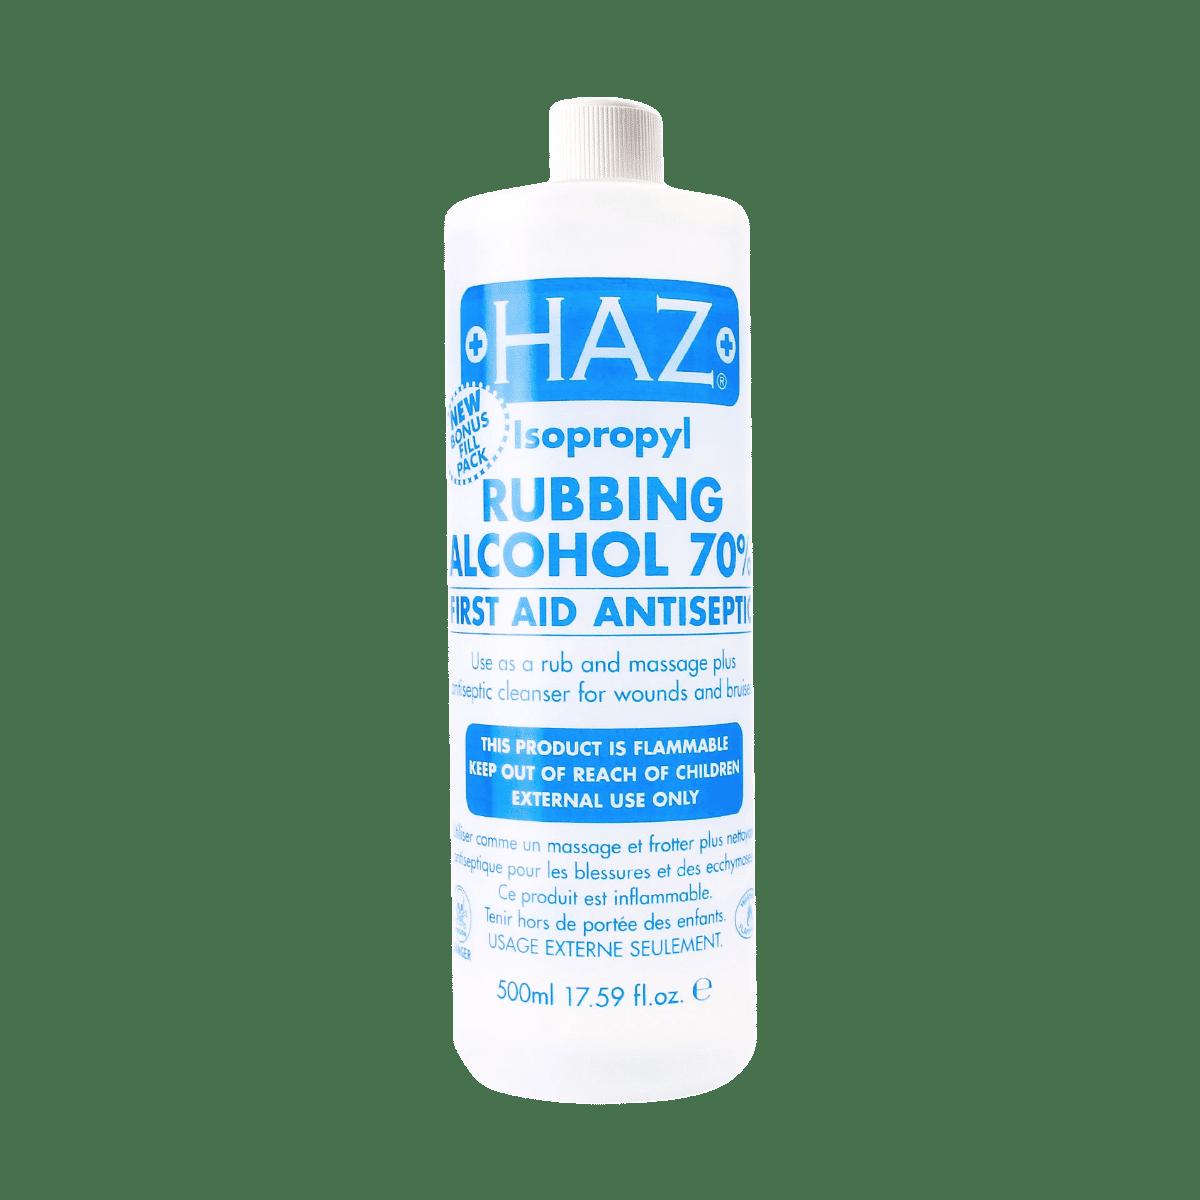 Haz Rubbing Alcohol 70% - 500ml